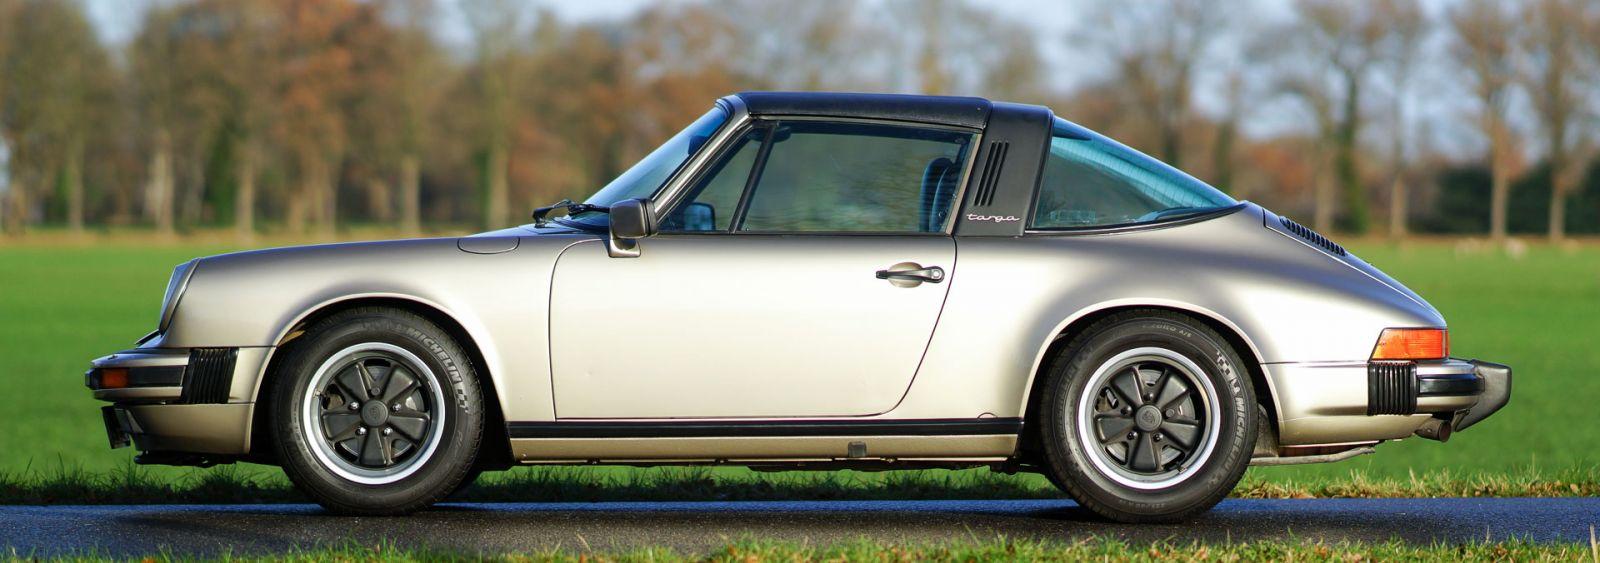 Porsche 911 3 2 Carrera Targa 1986 Welcome To Classicargarage